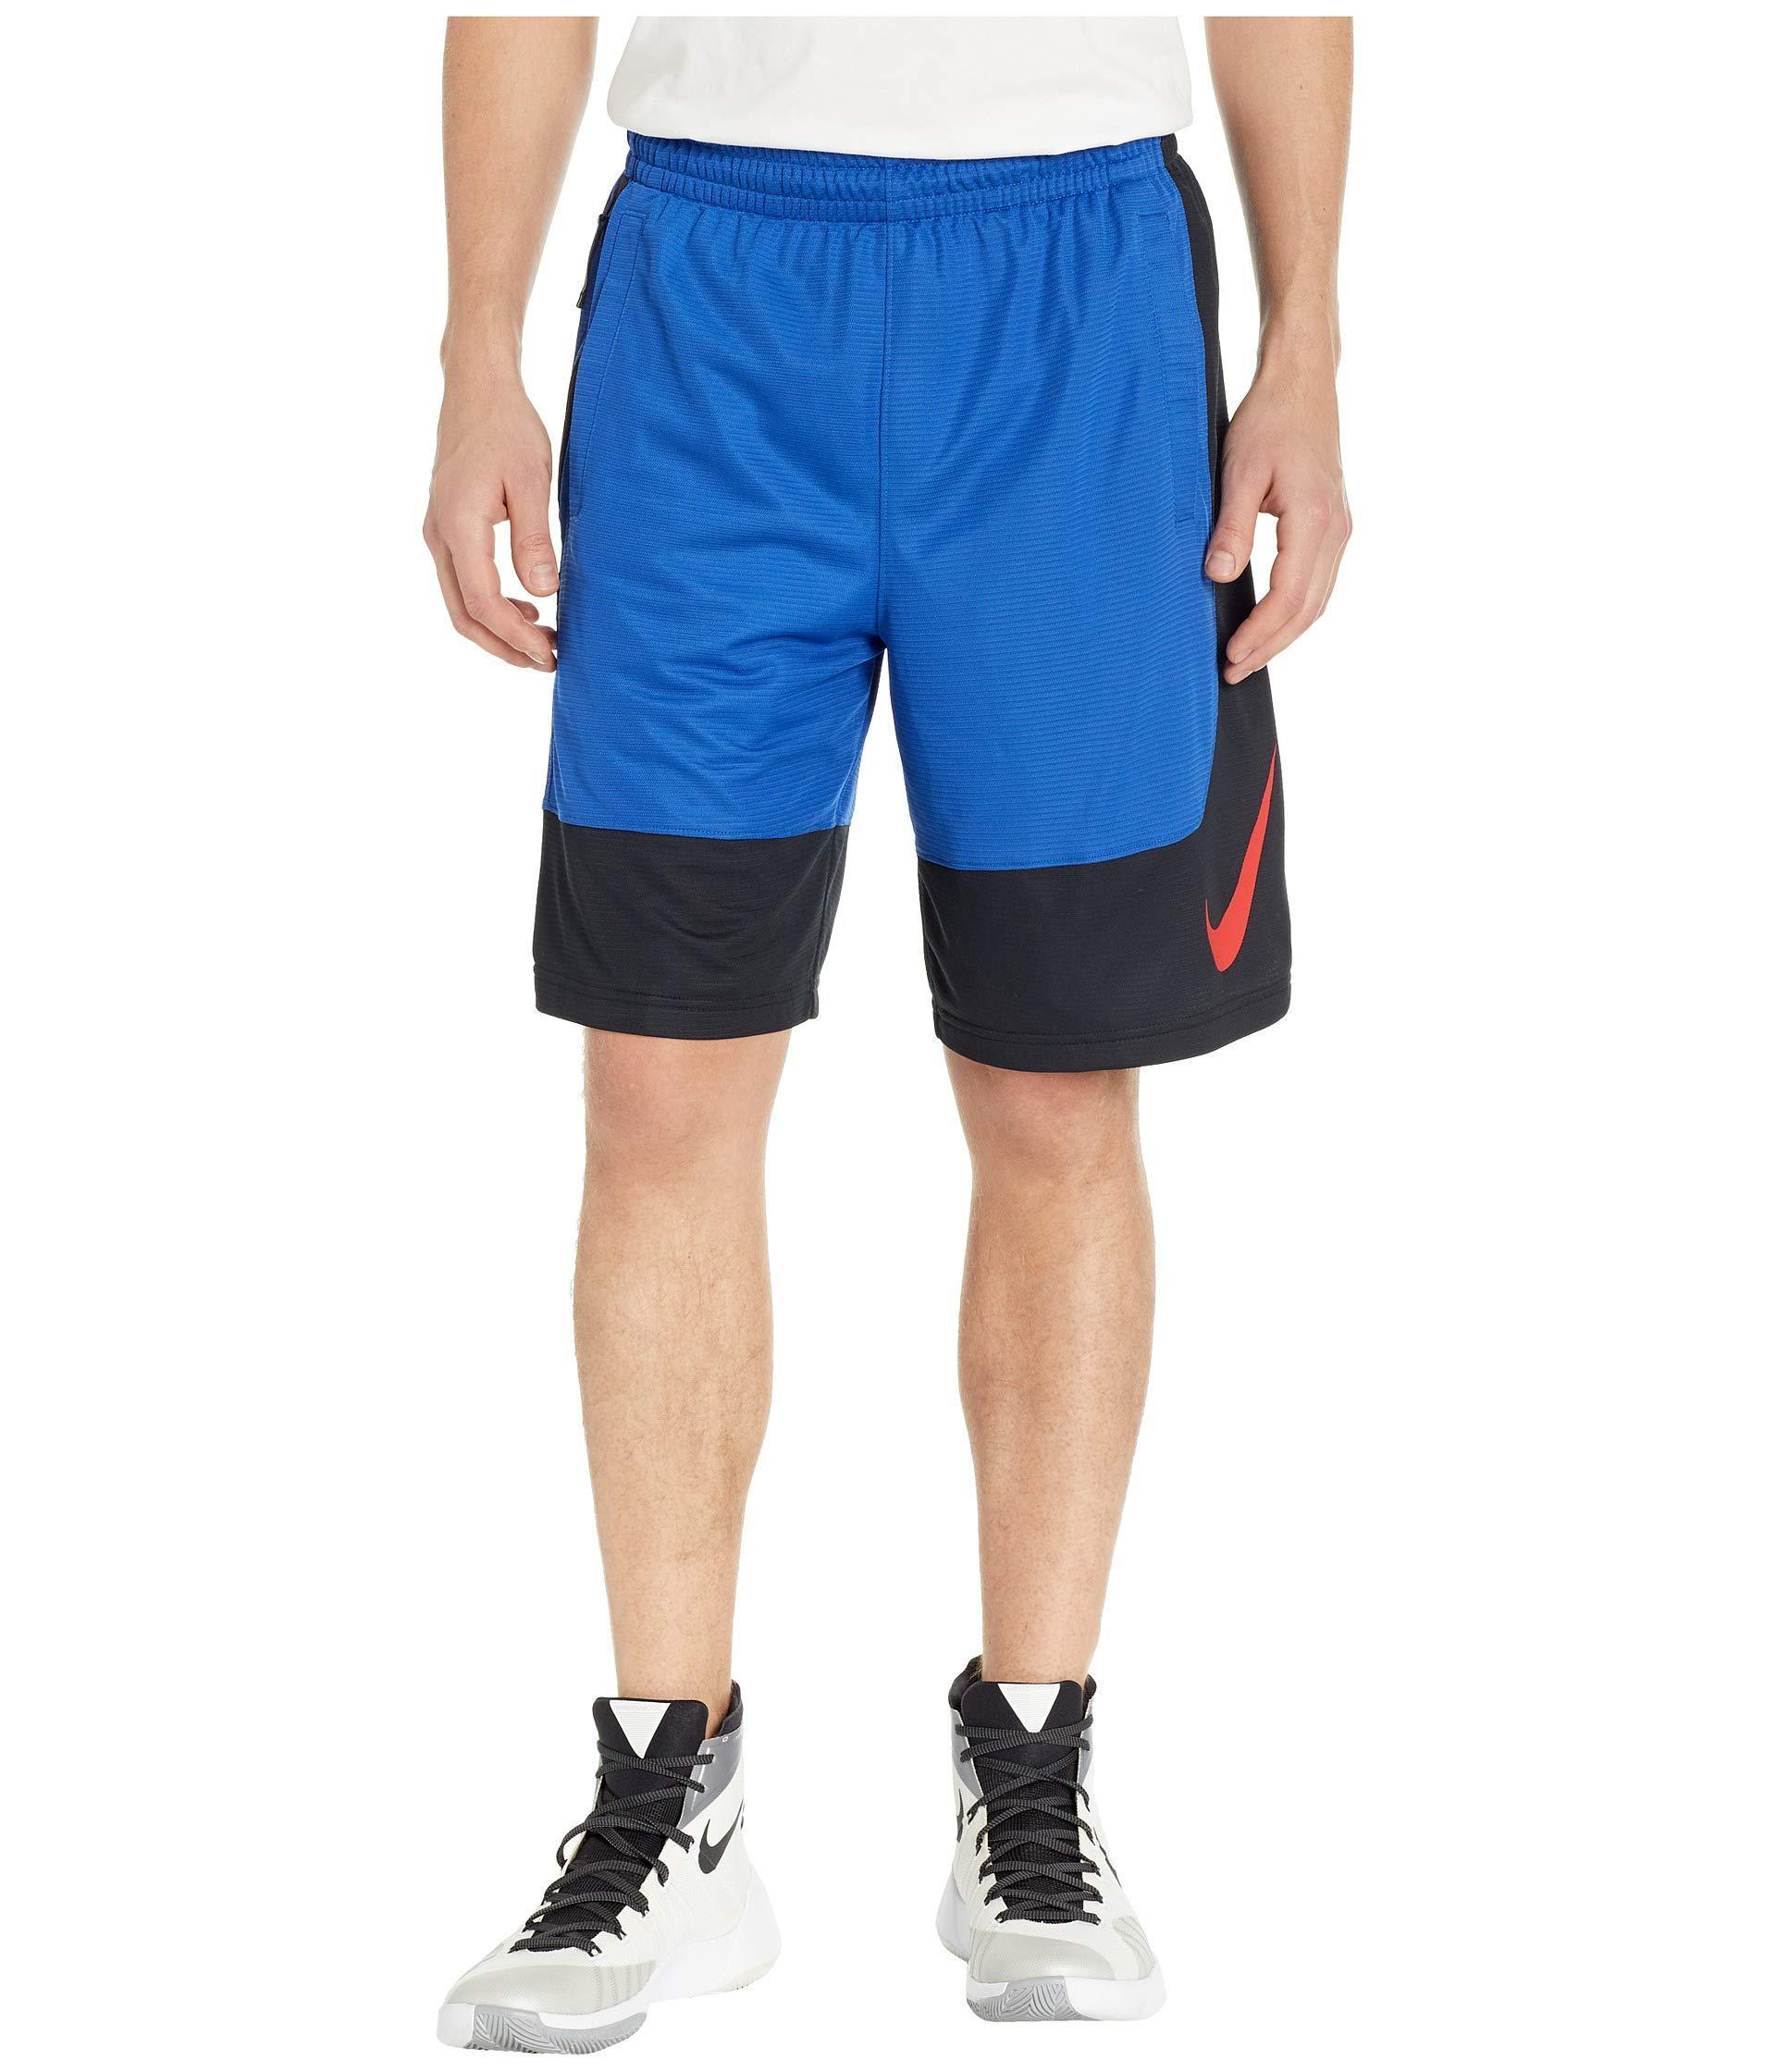 d953d1e58 Lyst - Nike Dry Shorts Asymmetrical (anthracite/black/white) Men's ...